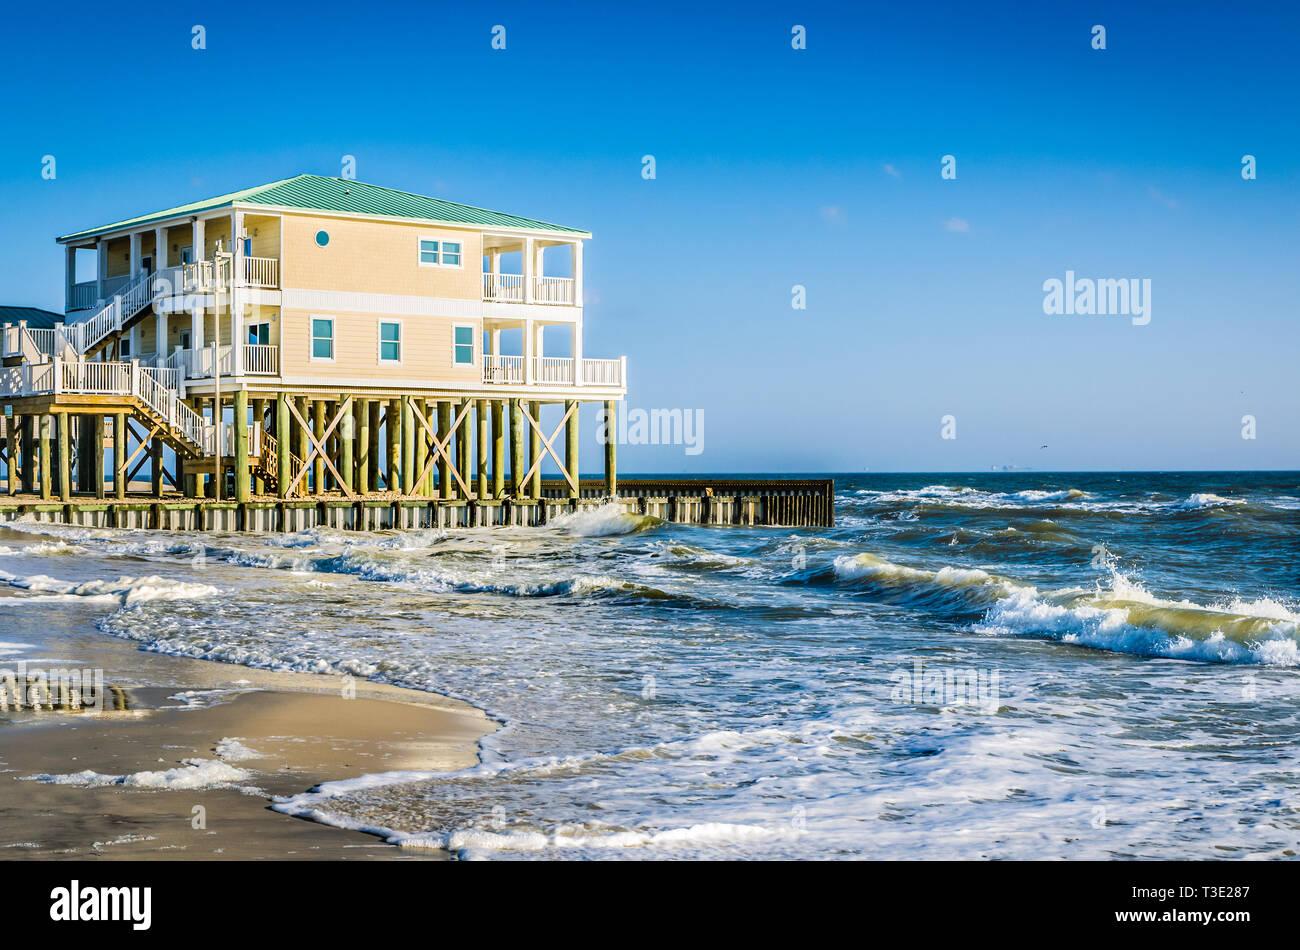 Waves crash alongside a beach house on Dauphin Island, Alabama Jan. 11, 2014. Stock Photo